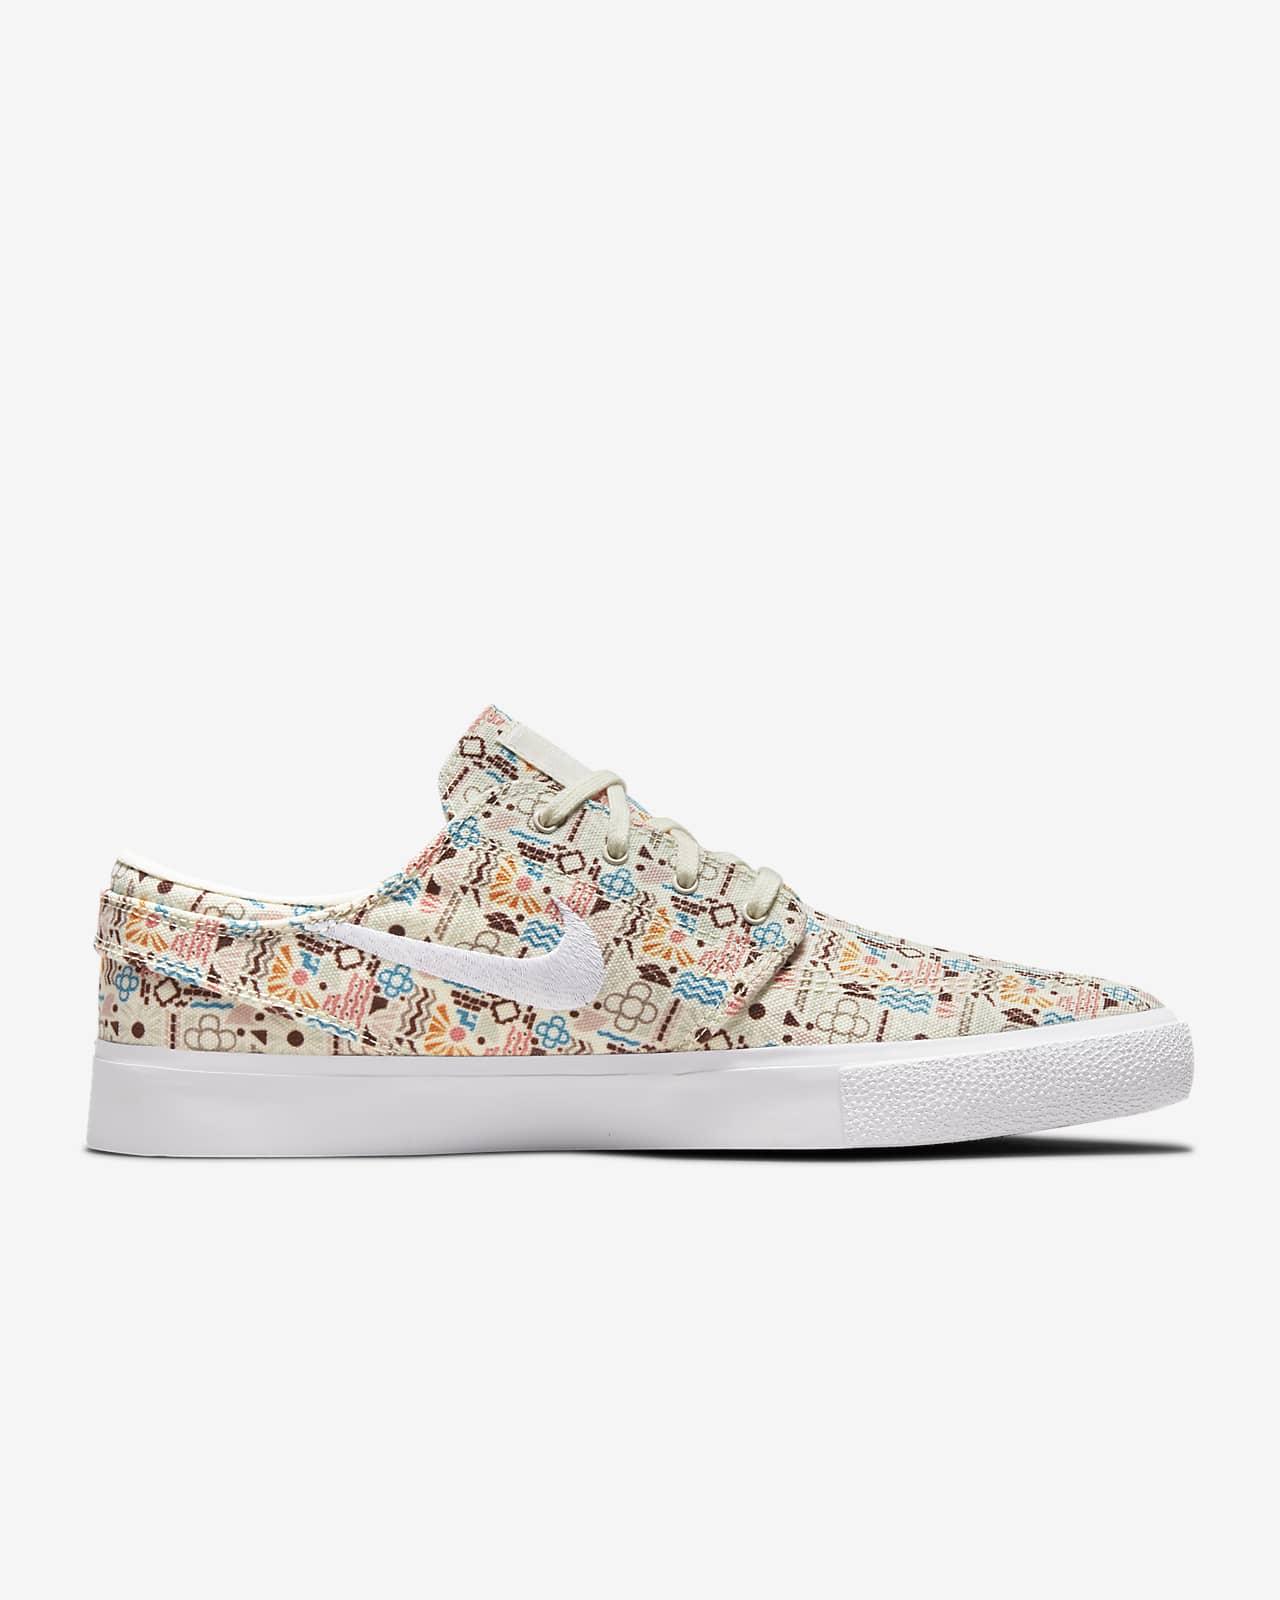 Chaussure de skateboard Nike SB Zoom Stefan Janoski Canvas RM Premium